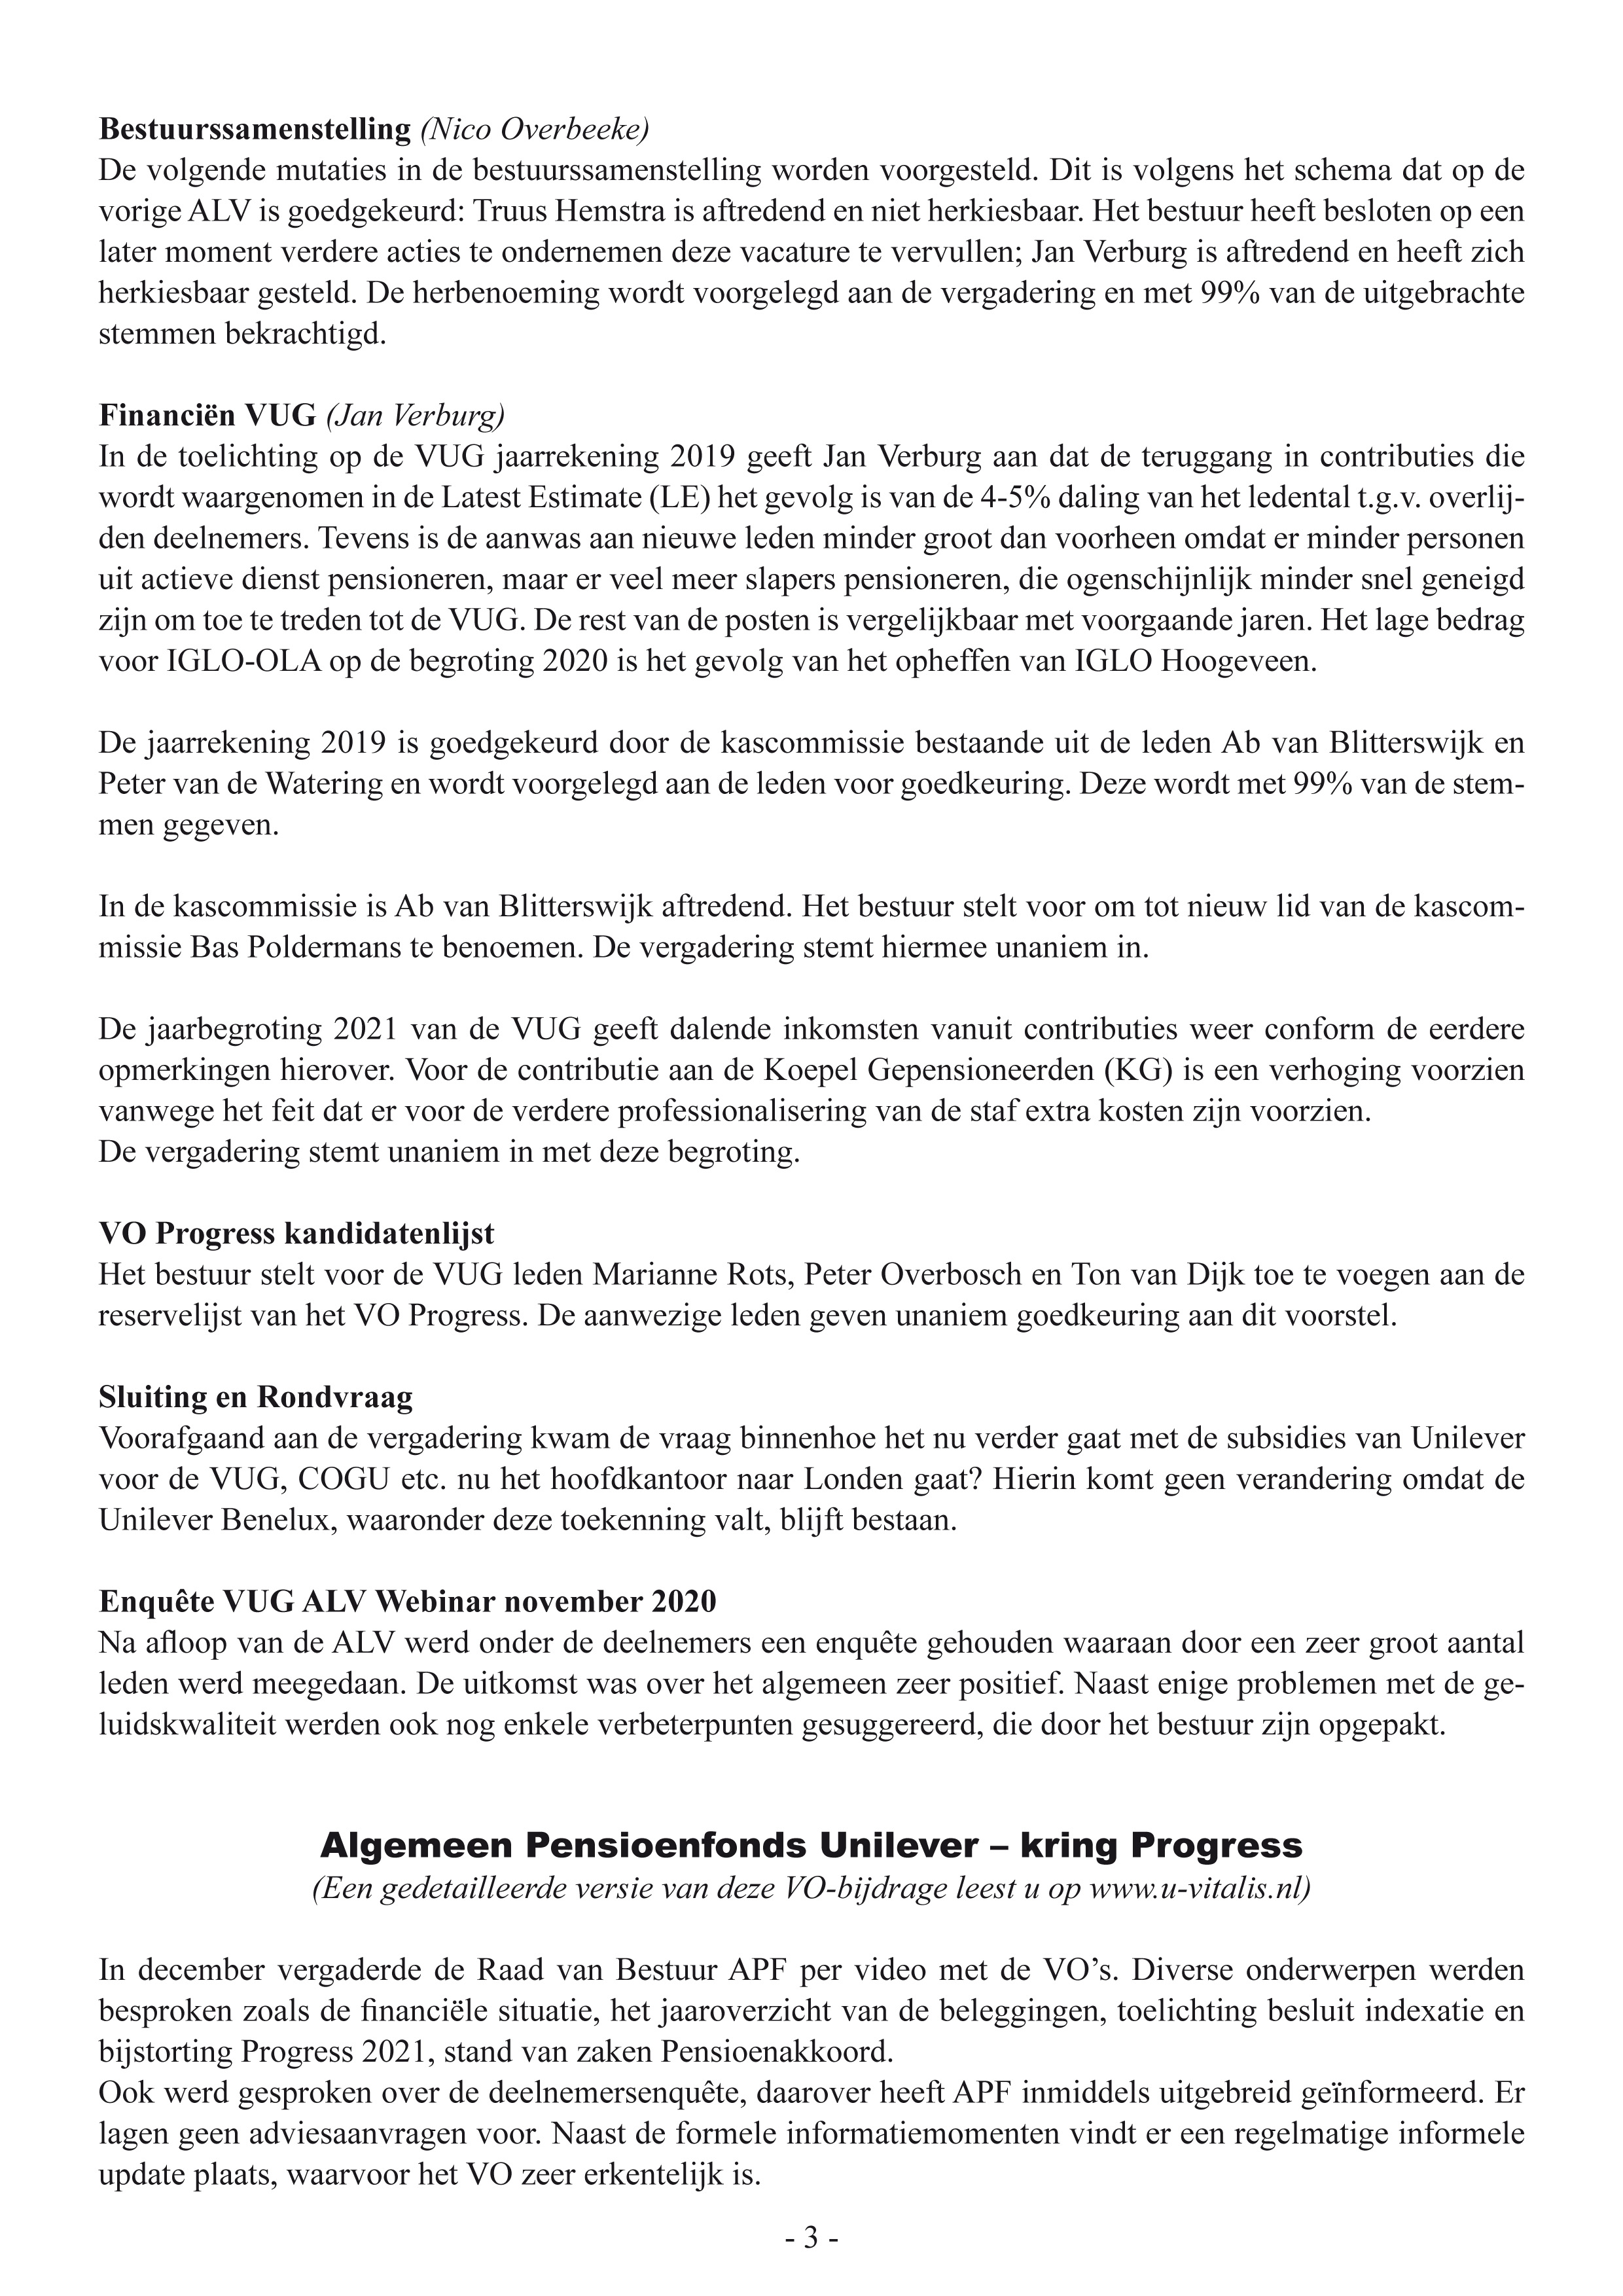 VUG 37 pagina 3